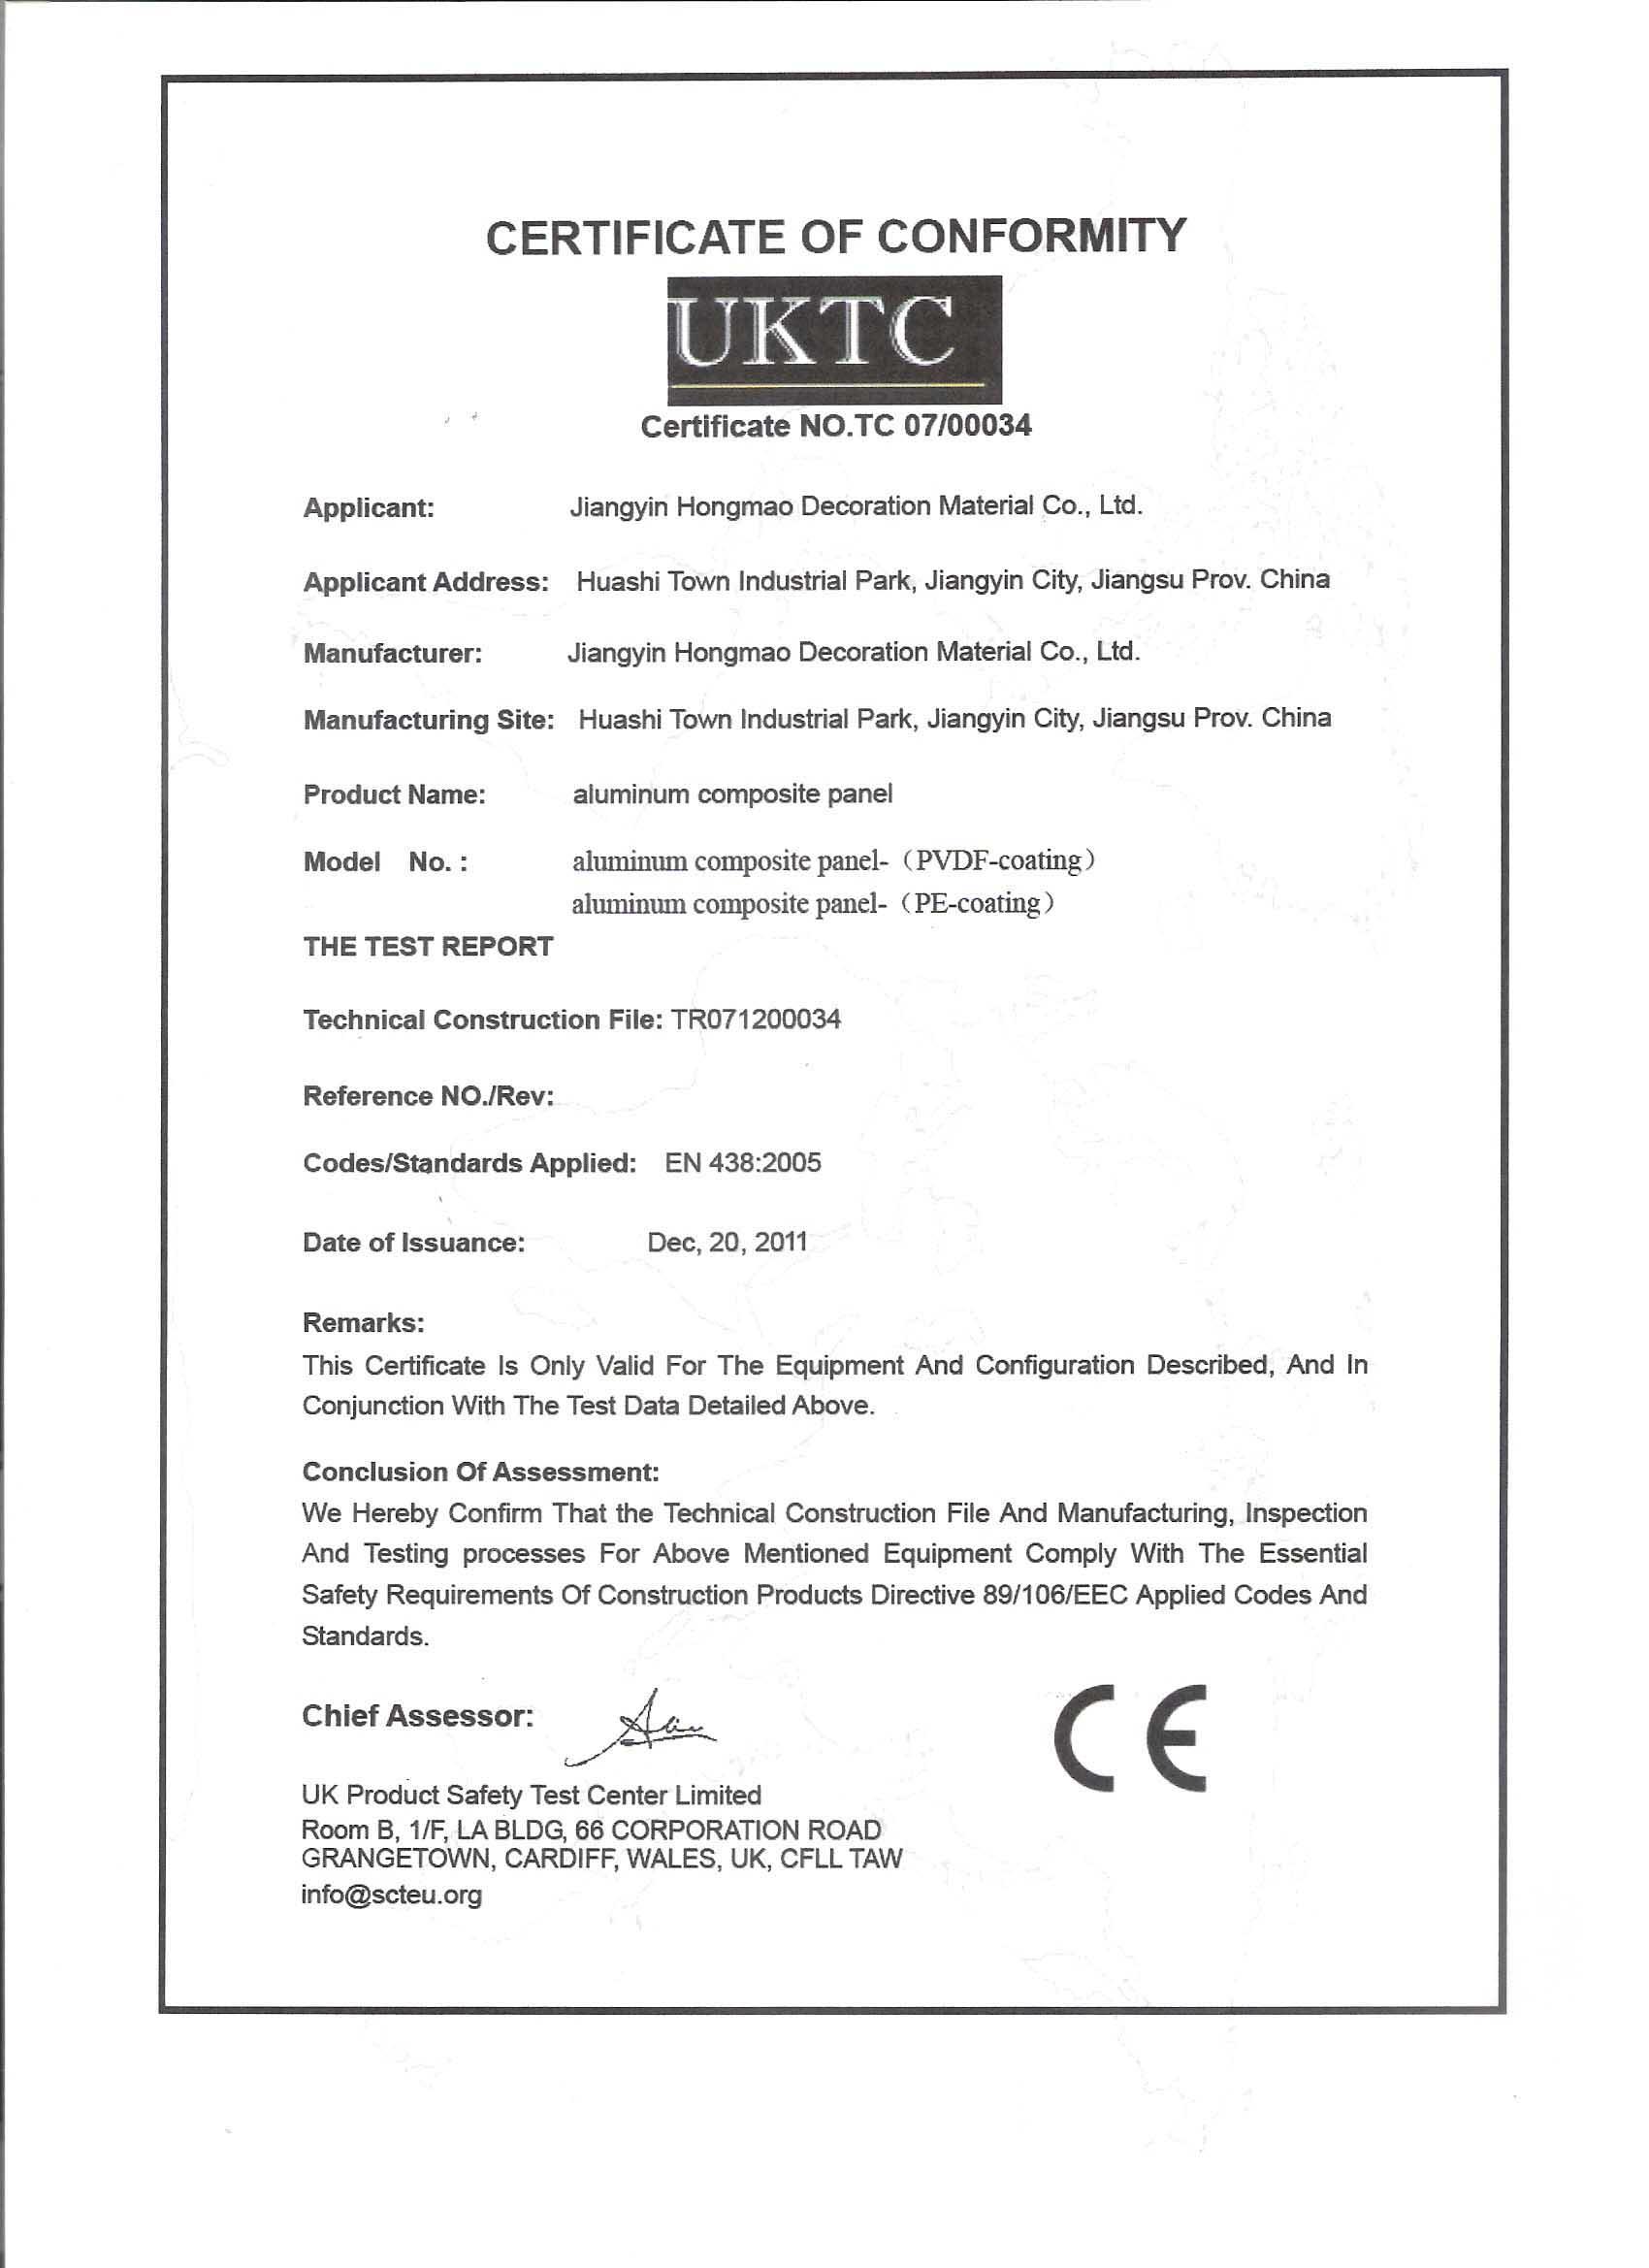 CE Certifaicate